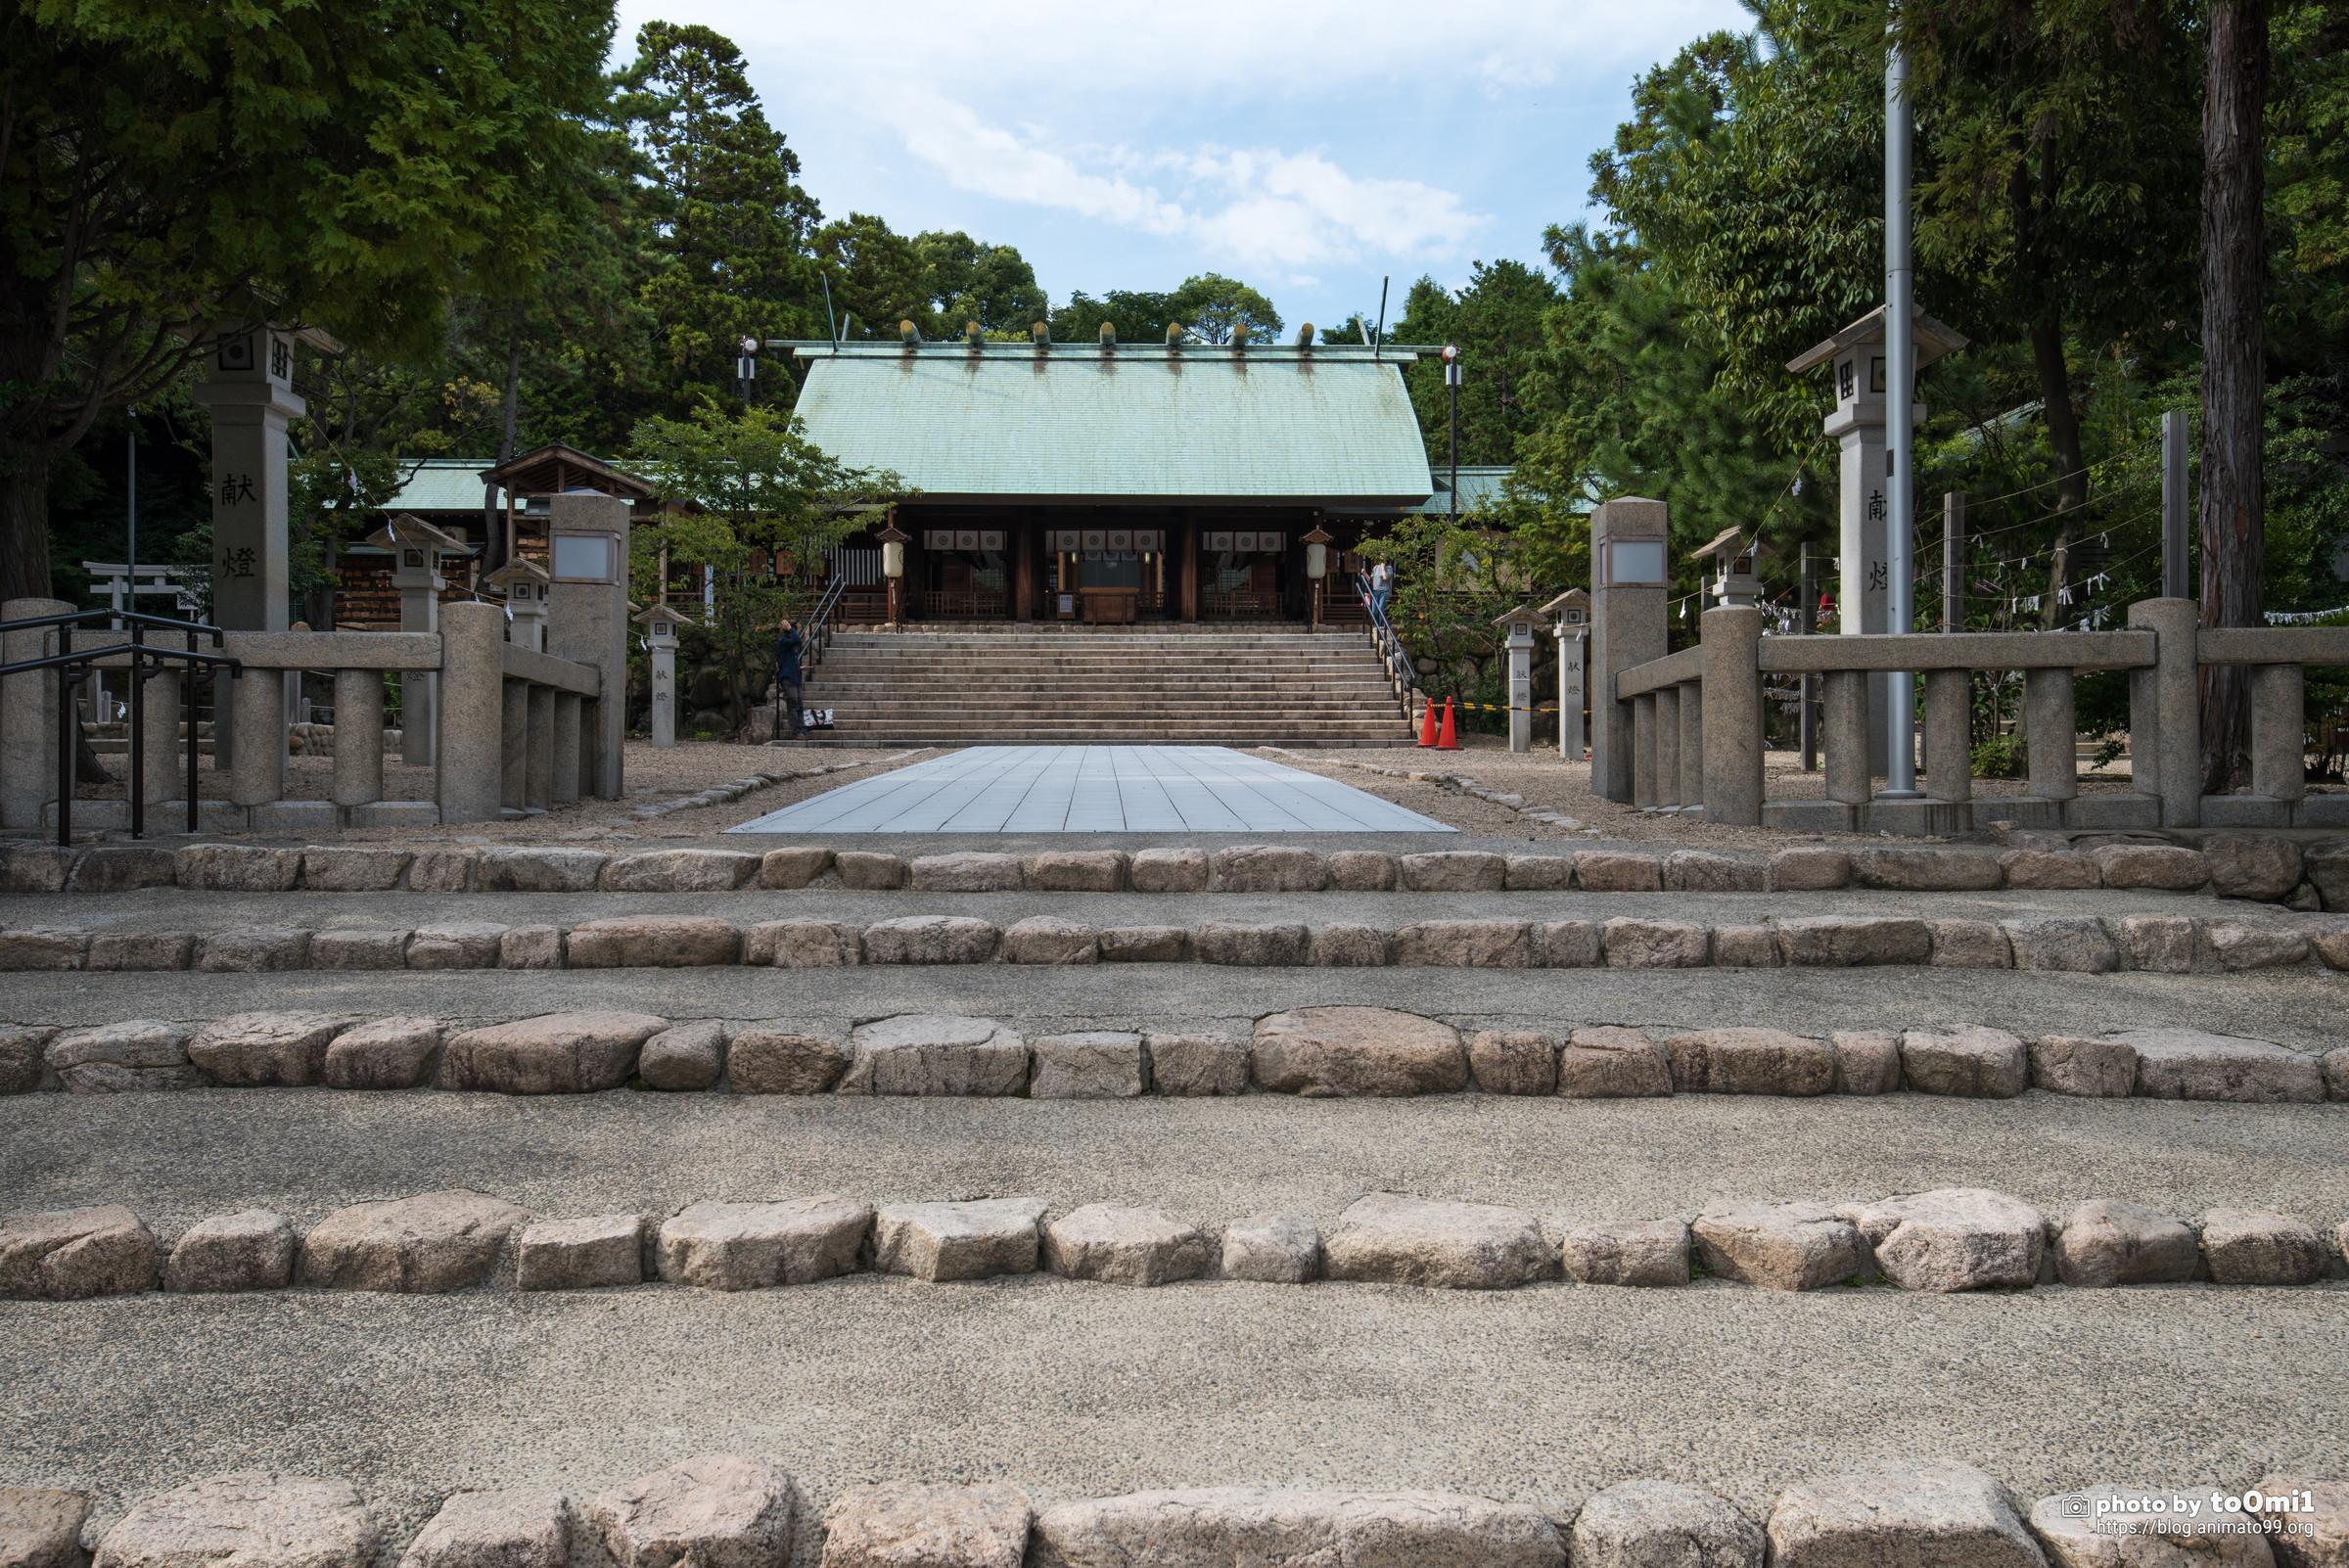 再び西宮へ【県立甲山森林公園】